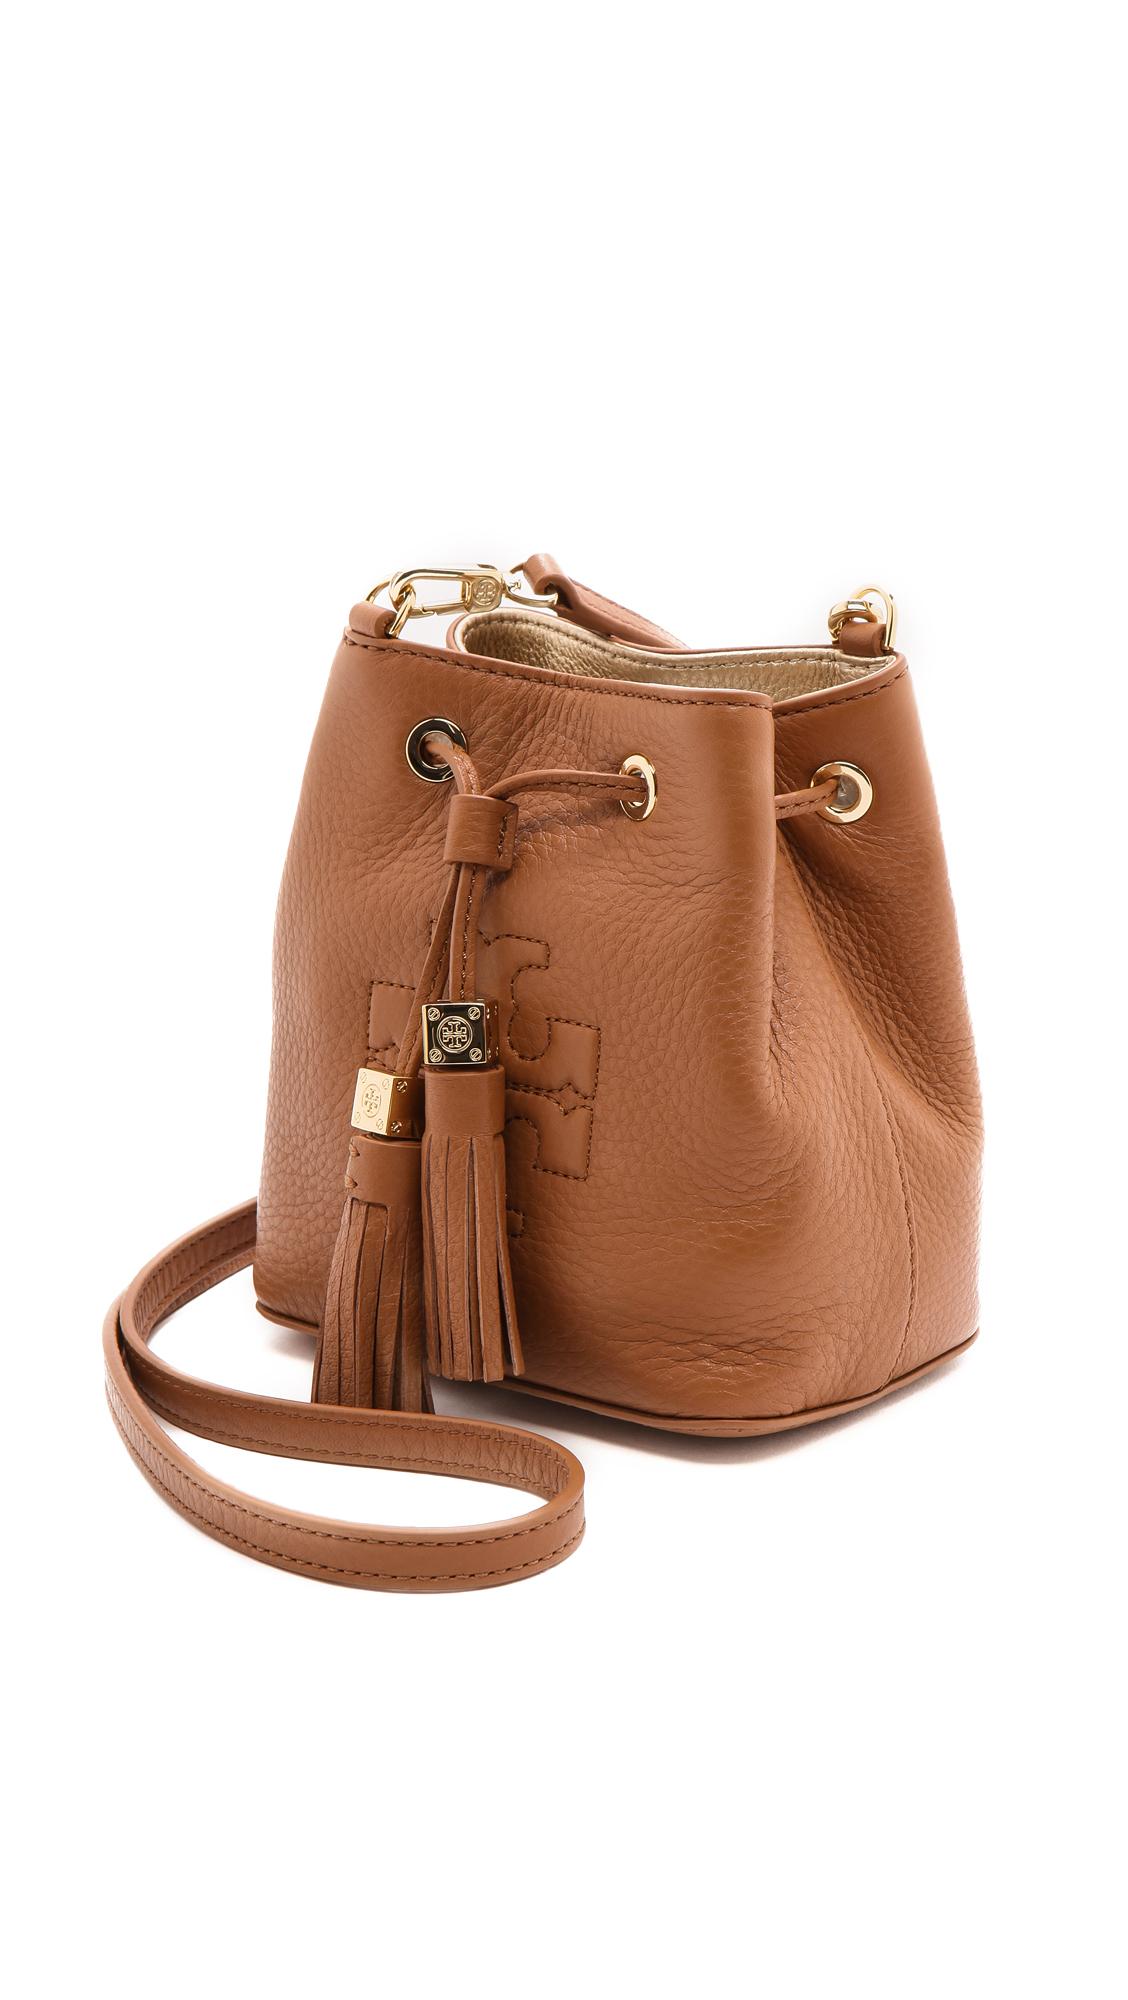 8f8362a29339 Lyst - Tory Burch Thea Mini Bucket Cross Body Bag - Black in Brown